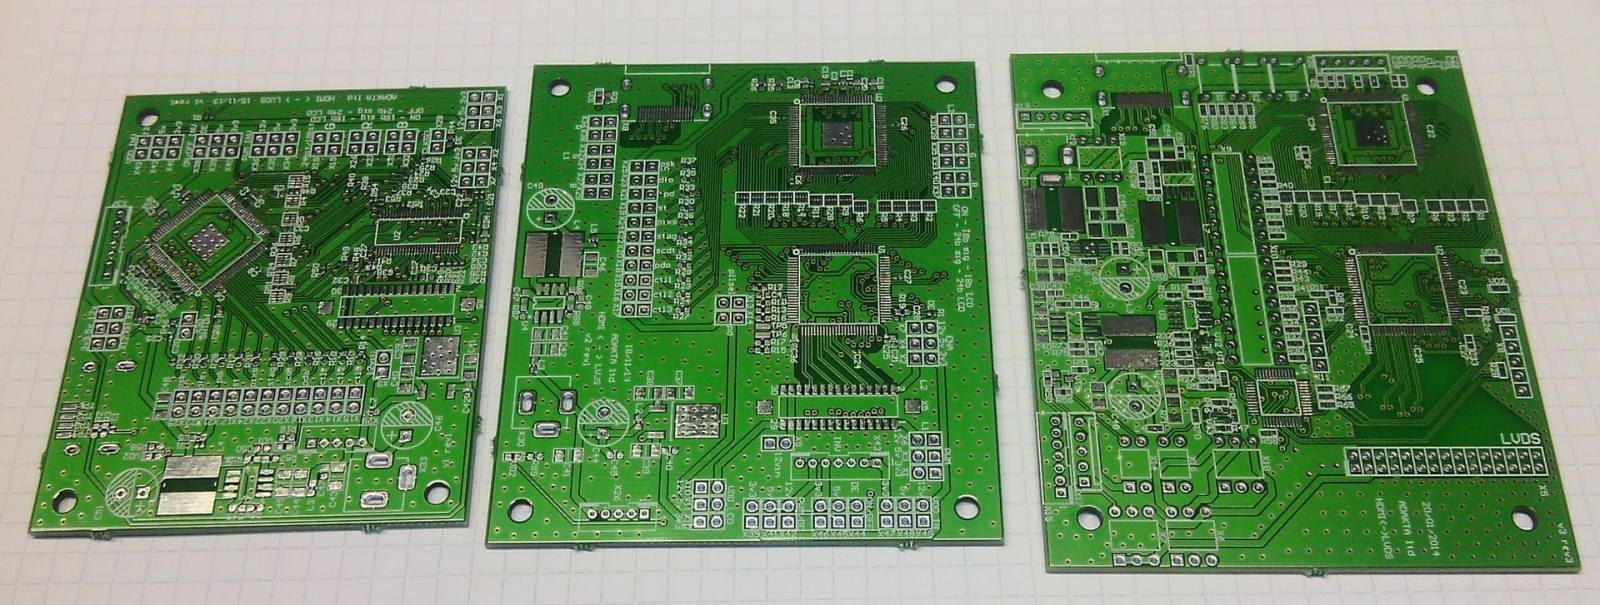 HDMI-LVDS. От макета к релизу - 4